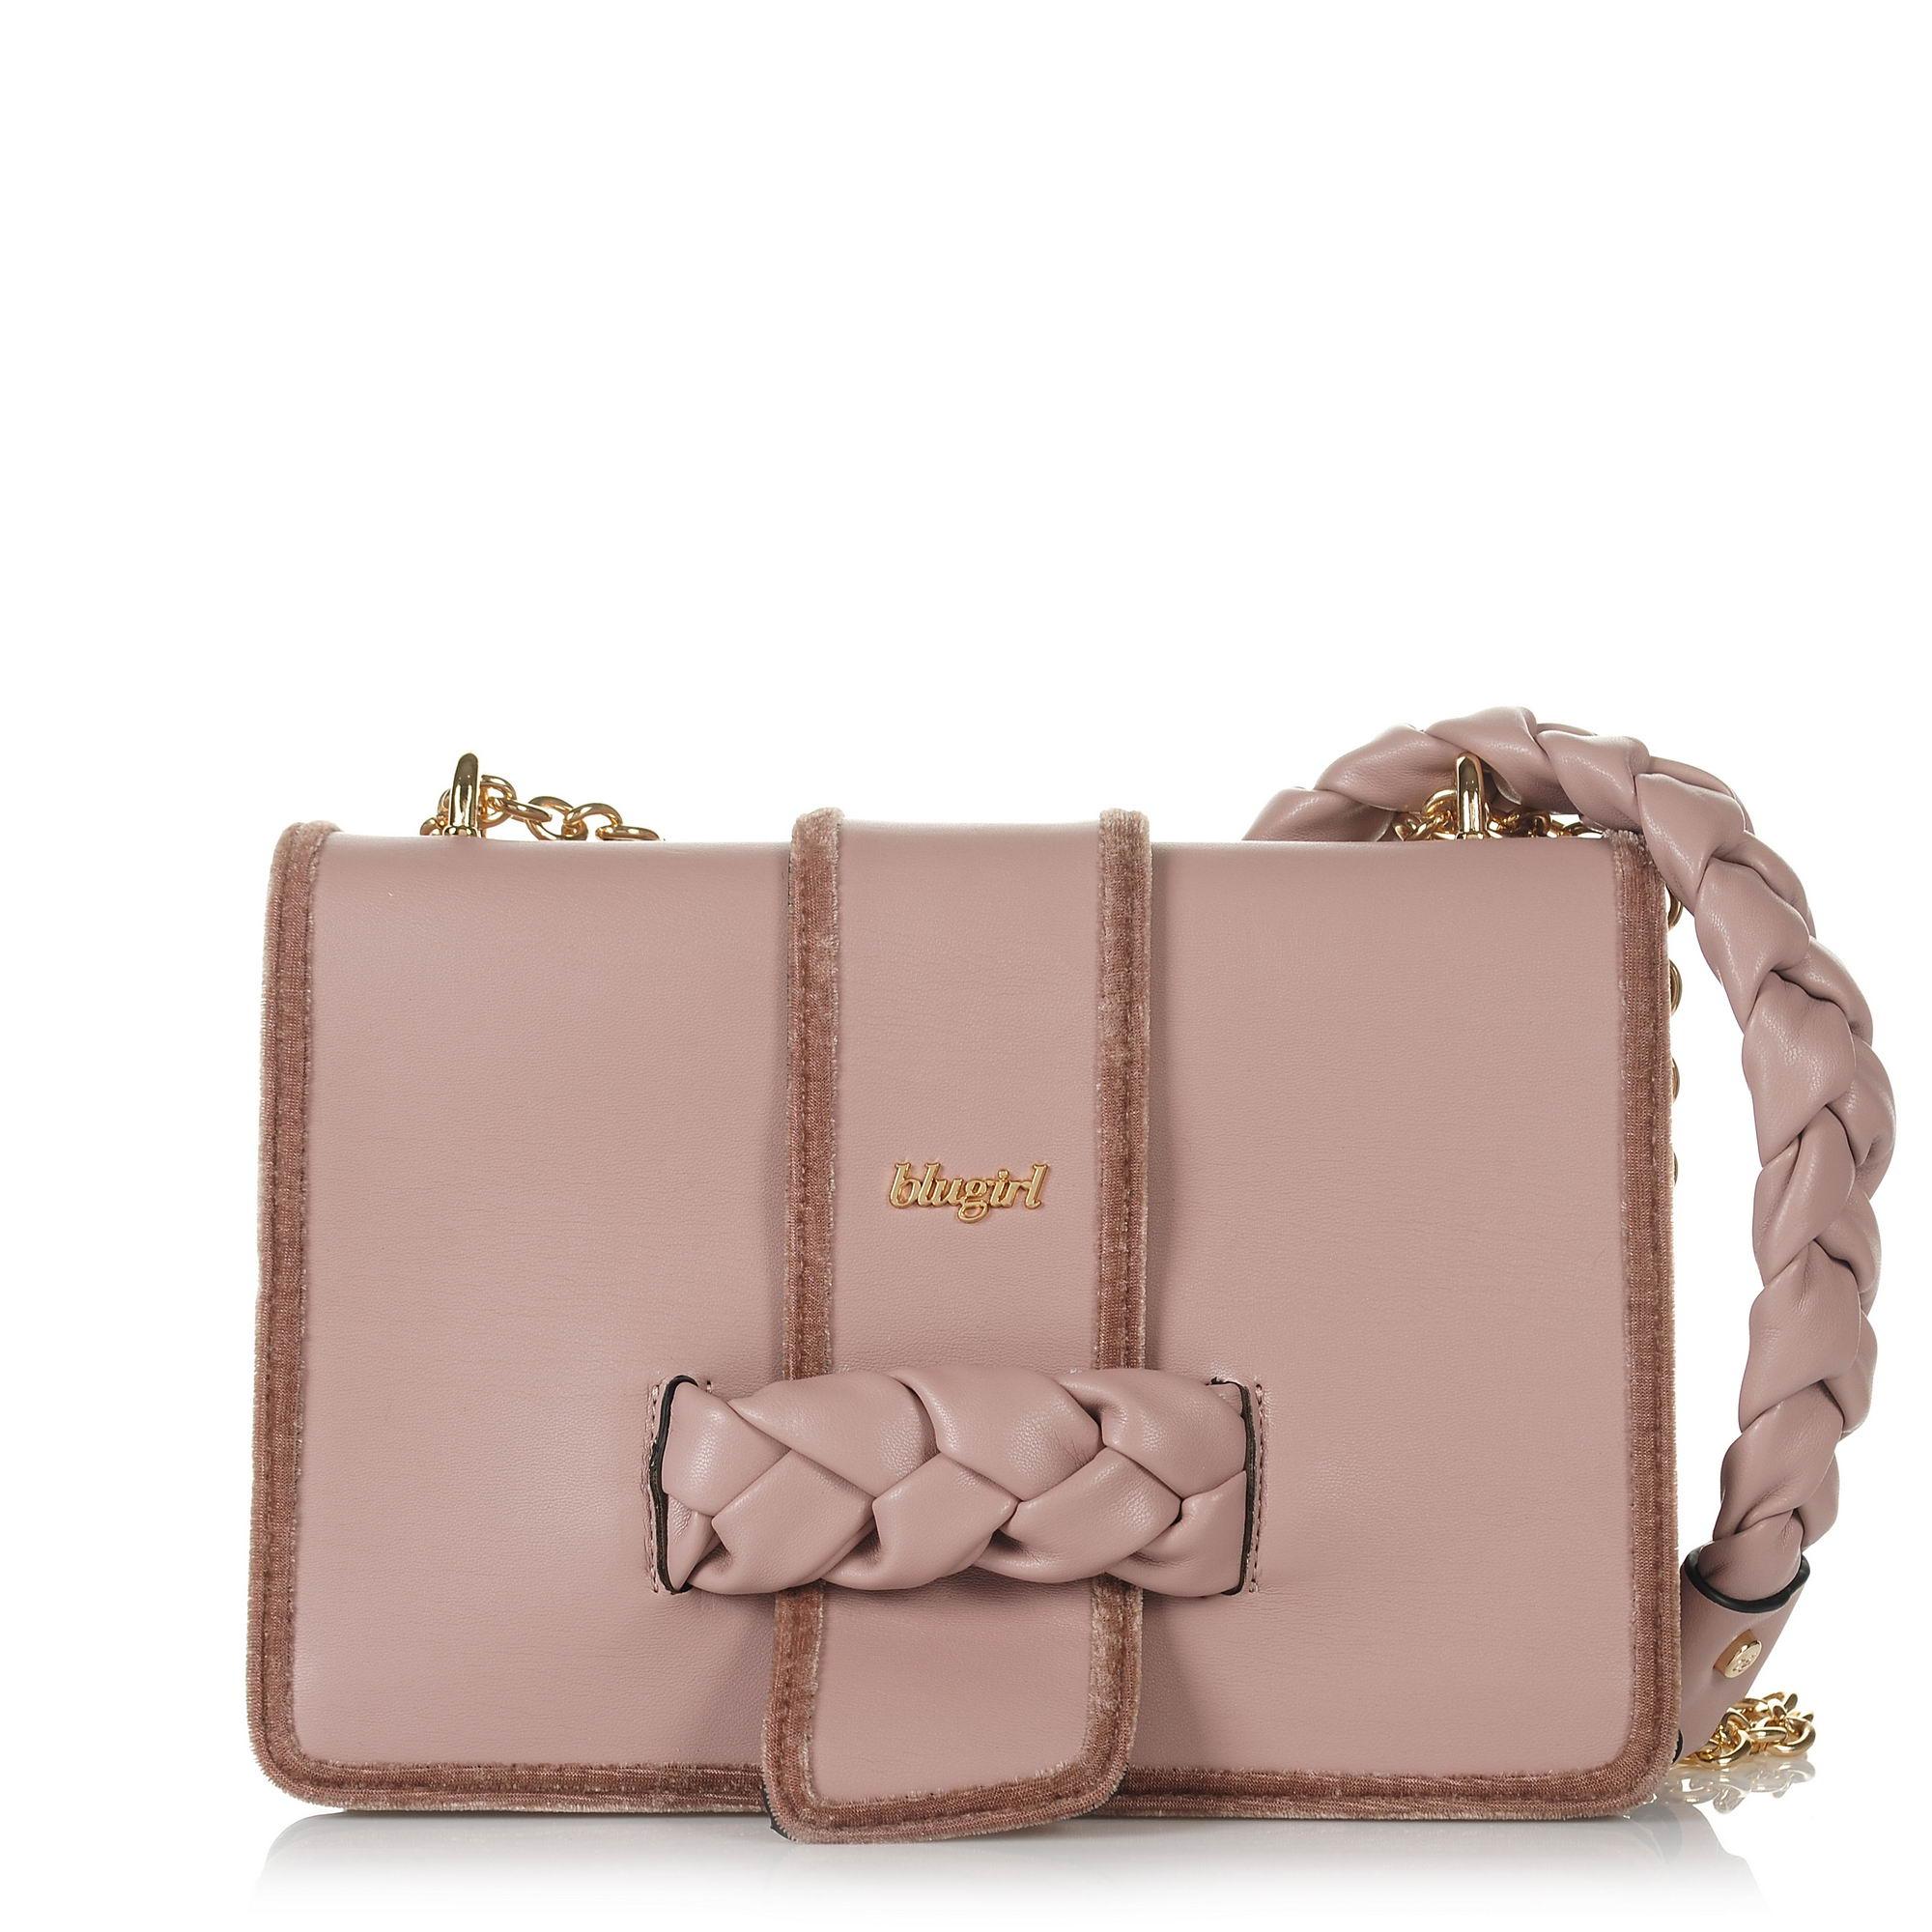 6b9cc3fb68 -40% Brand Bags Τσάντα Ώμου-Χιαστί Blugirl 318001Α